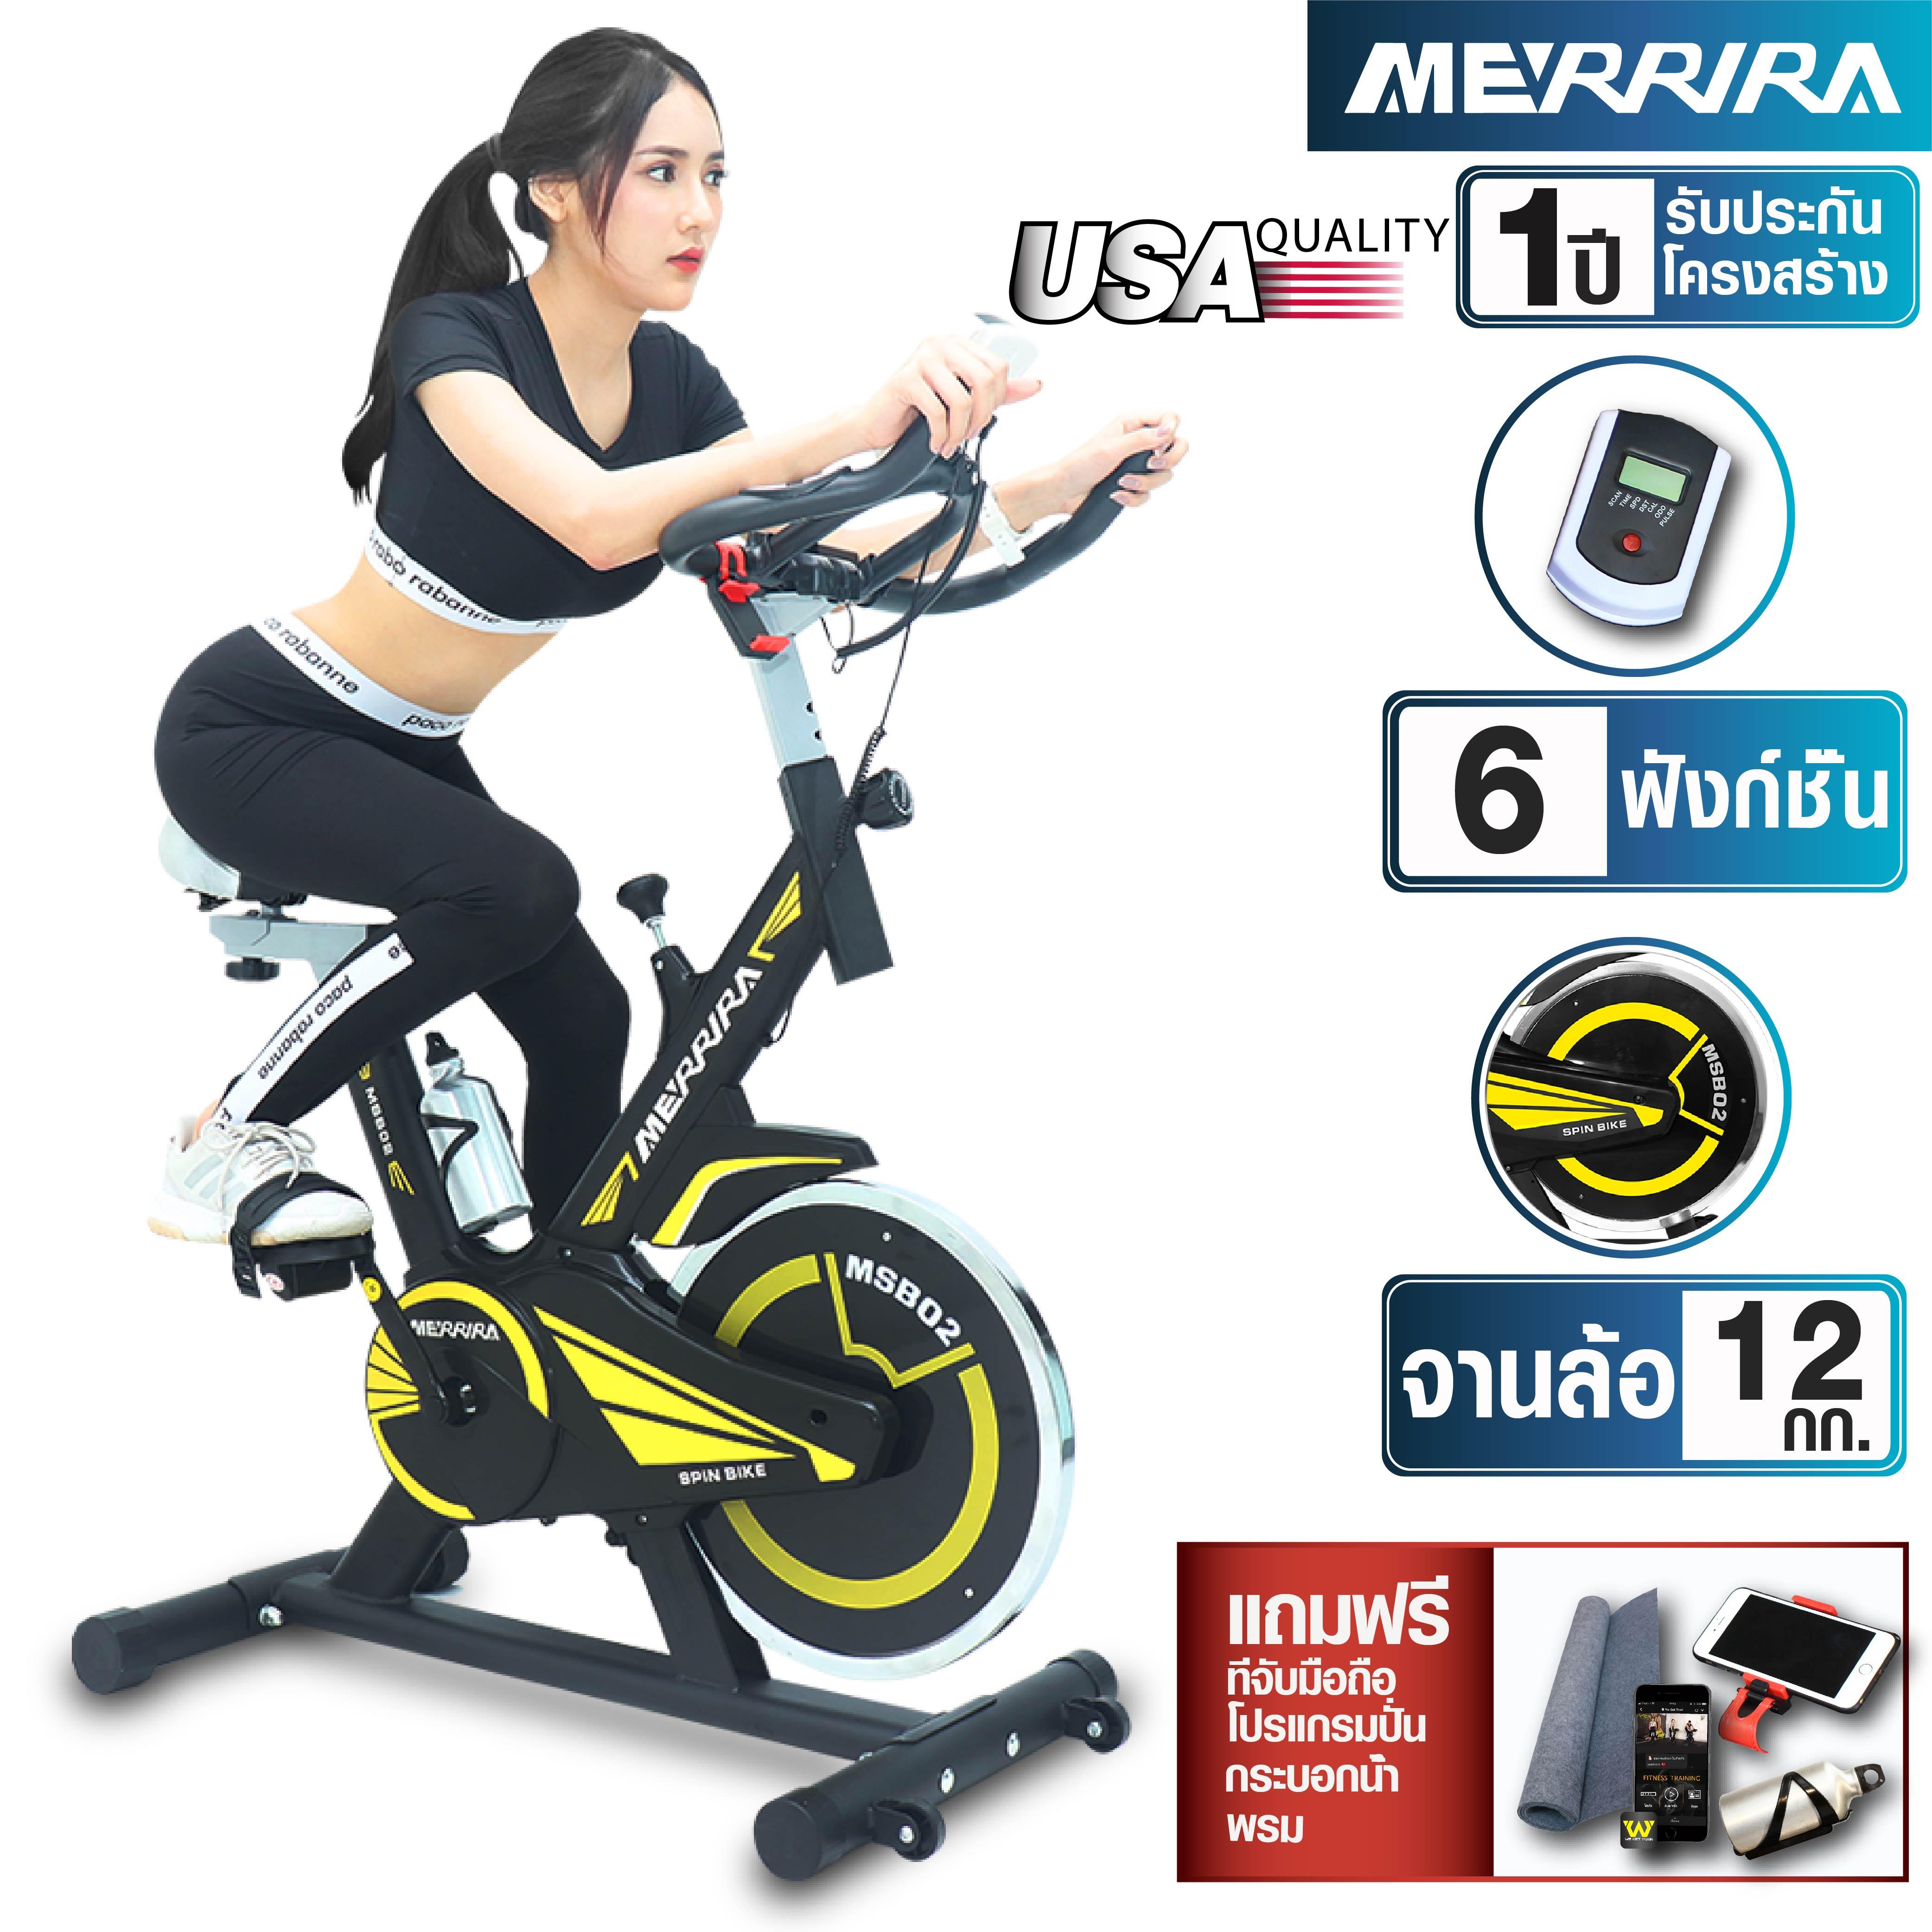 Merrira จักรยาน Spin Bike รุ่น Msb02 จักรยานออกกำลังกาย จักรยานฟิตเนส สปินไบค์ เครื่องออกกำลังกายจักรยาน เครื่องปั่นจักรยาน ที่ปั่นจักรยาน.